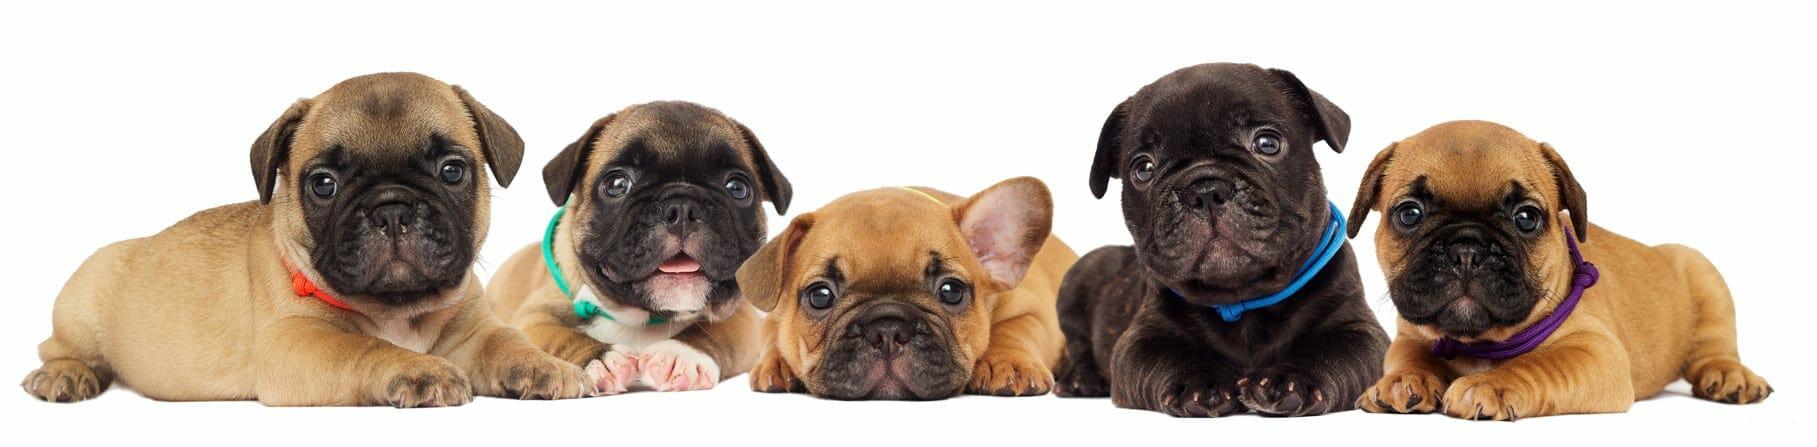 french bulldog puppies - french bulldog puppy